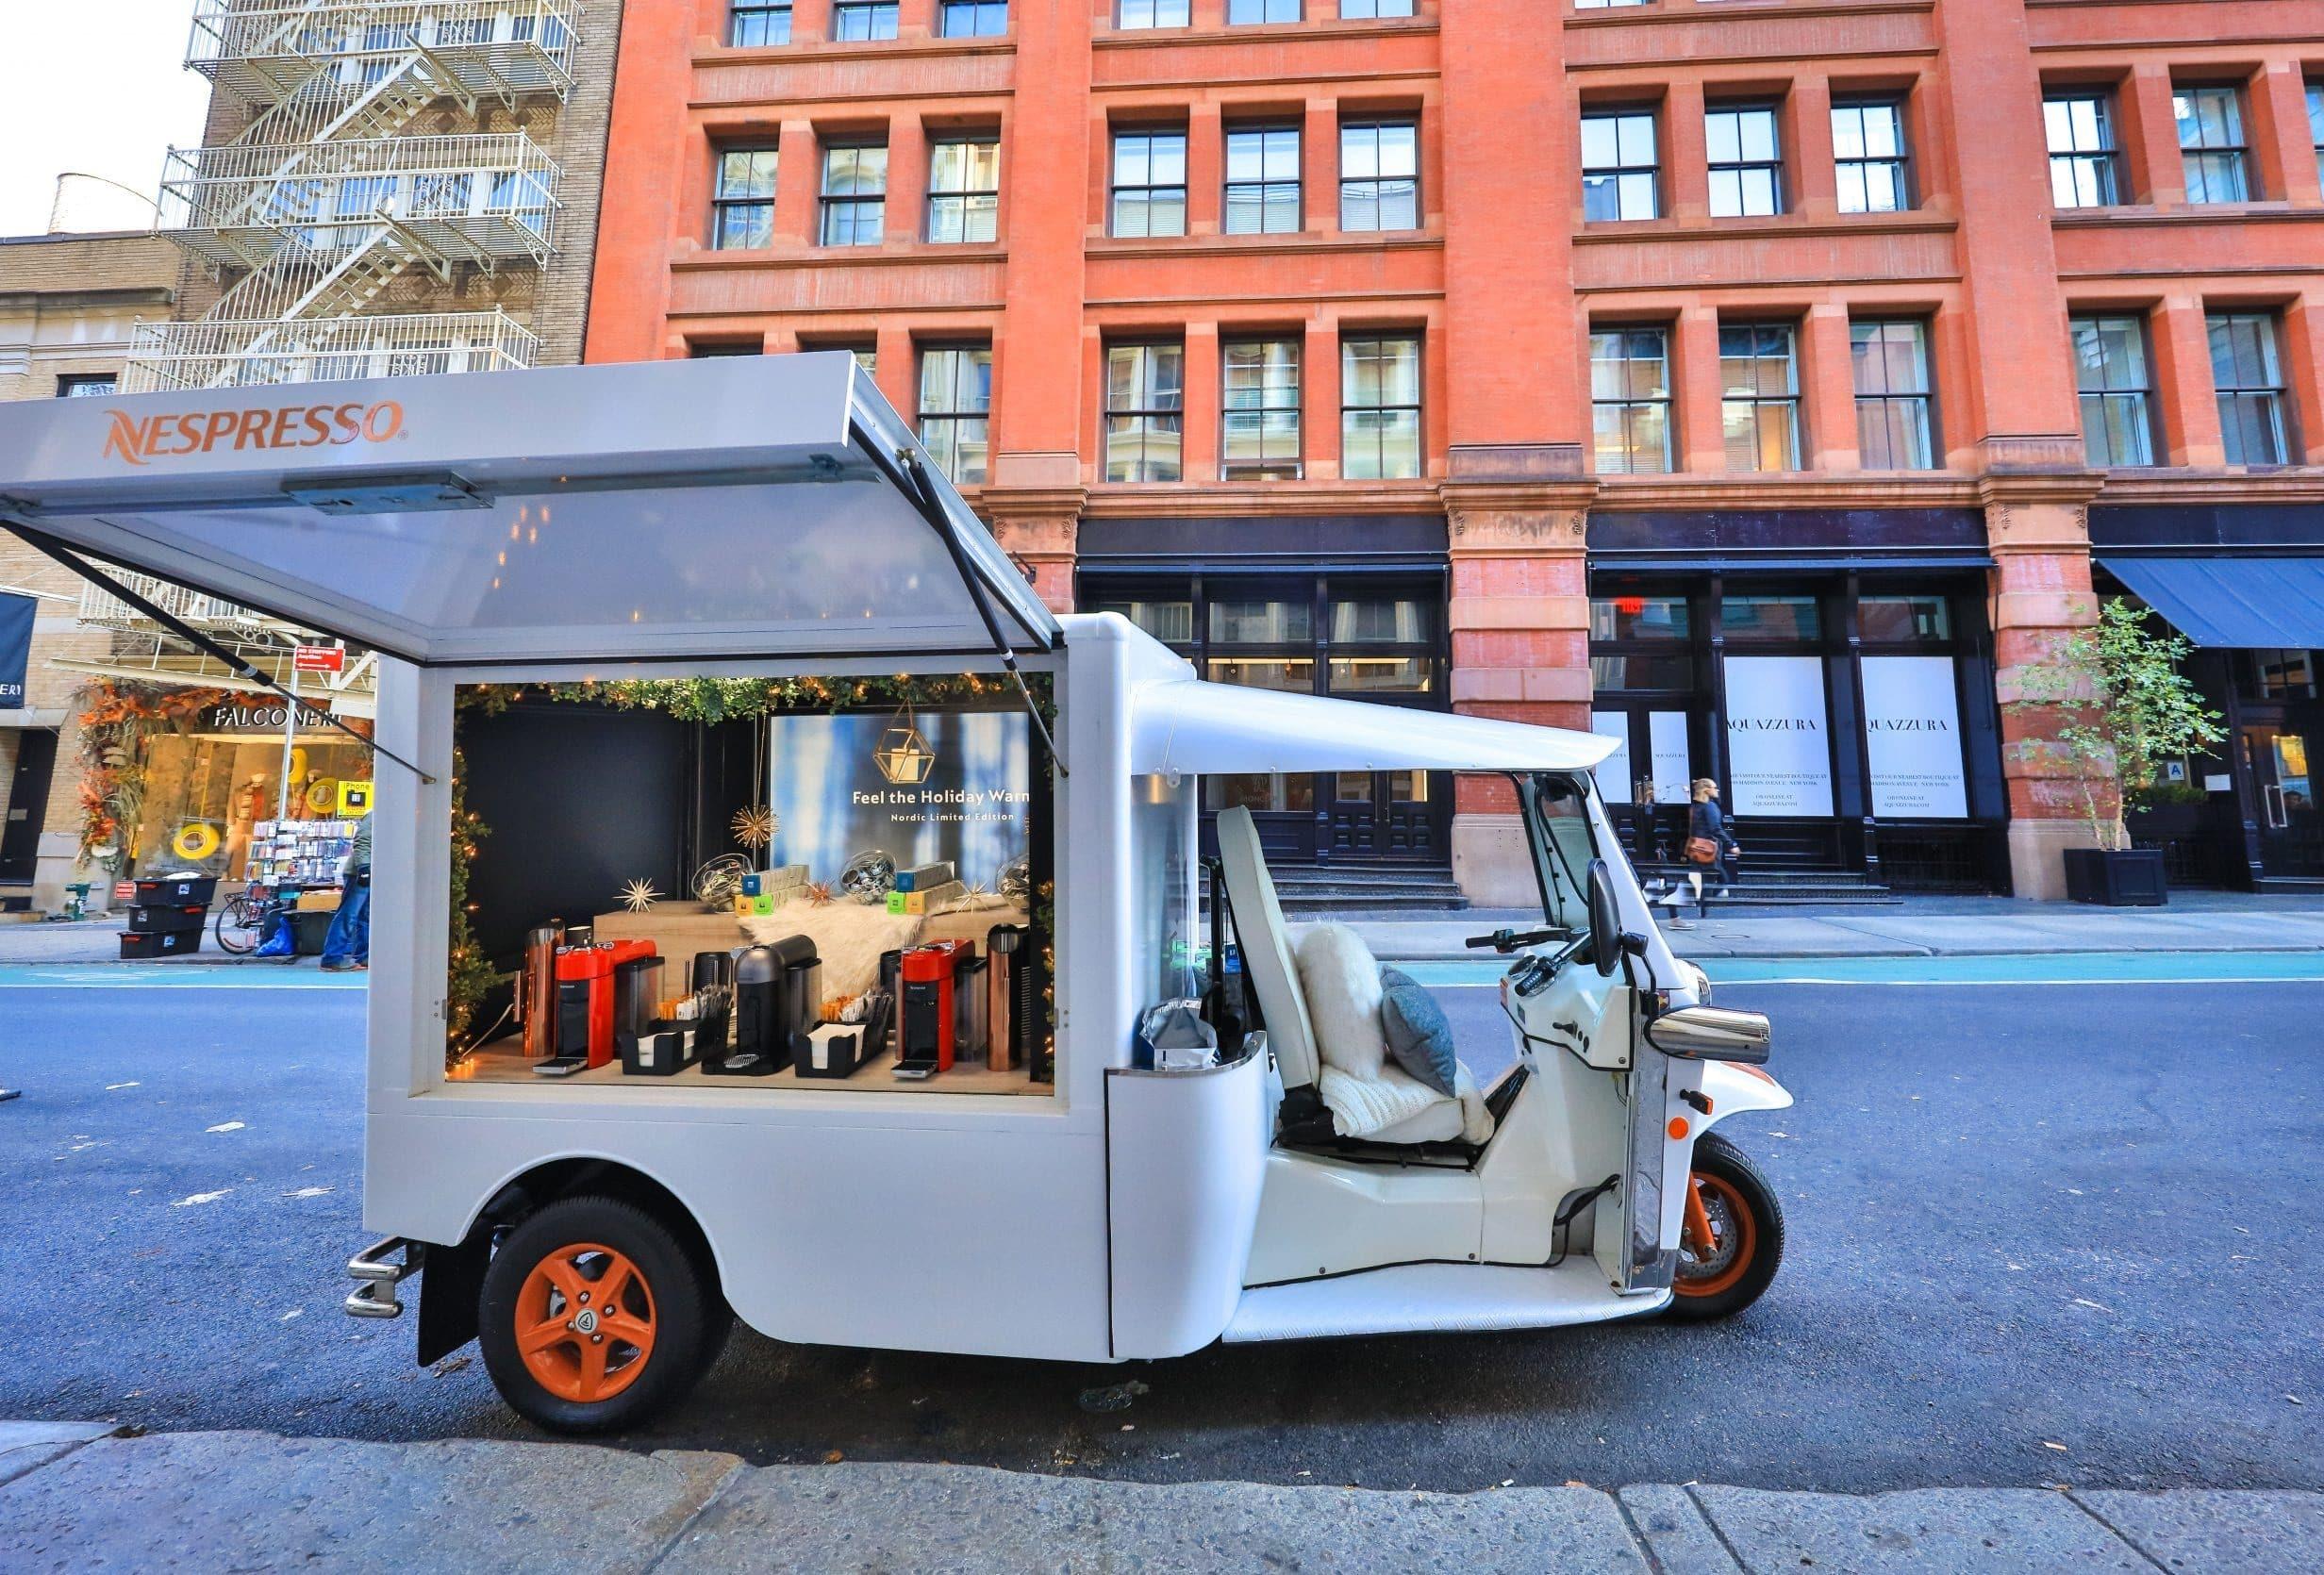 Mobile Pop Up Shop